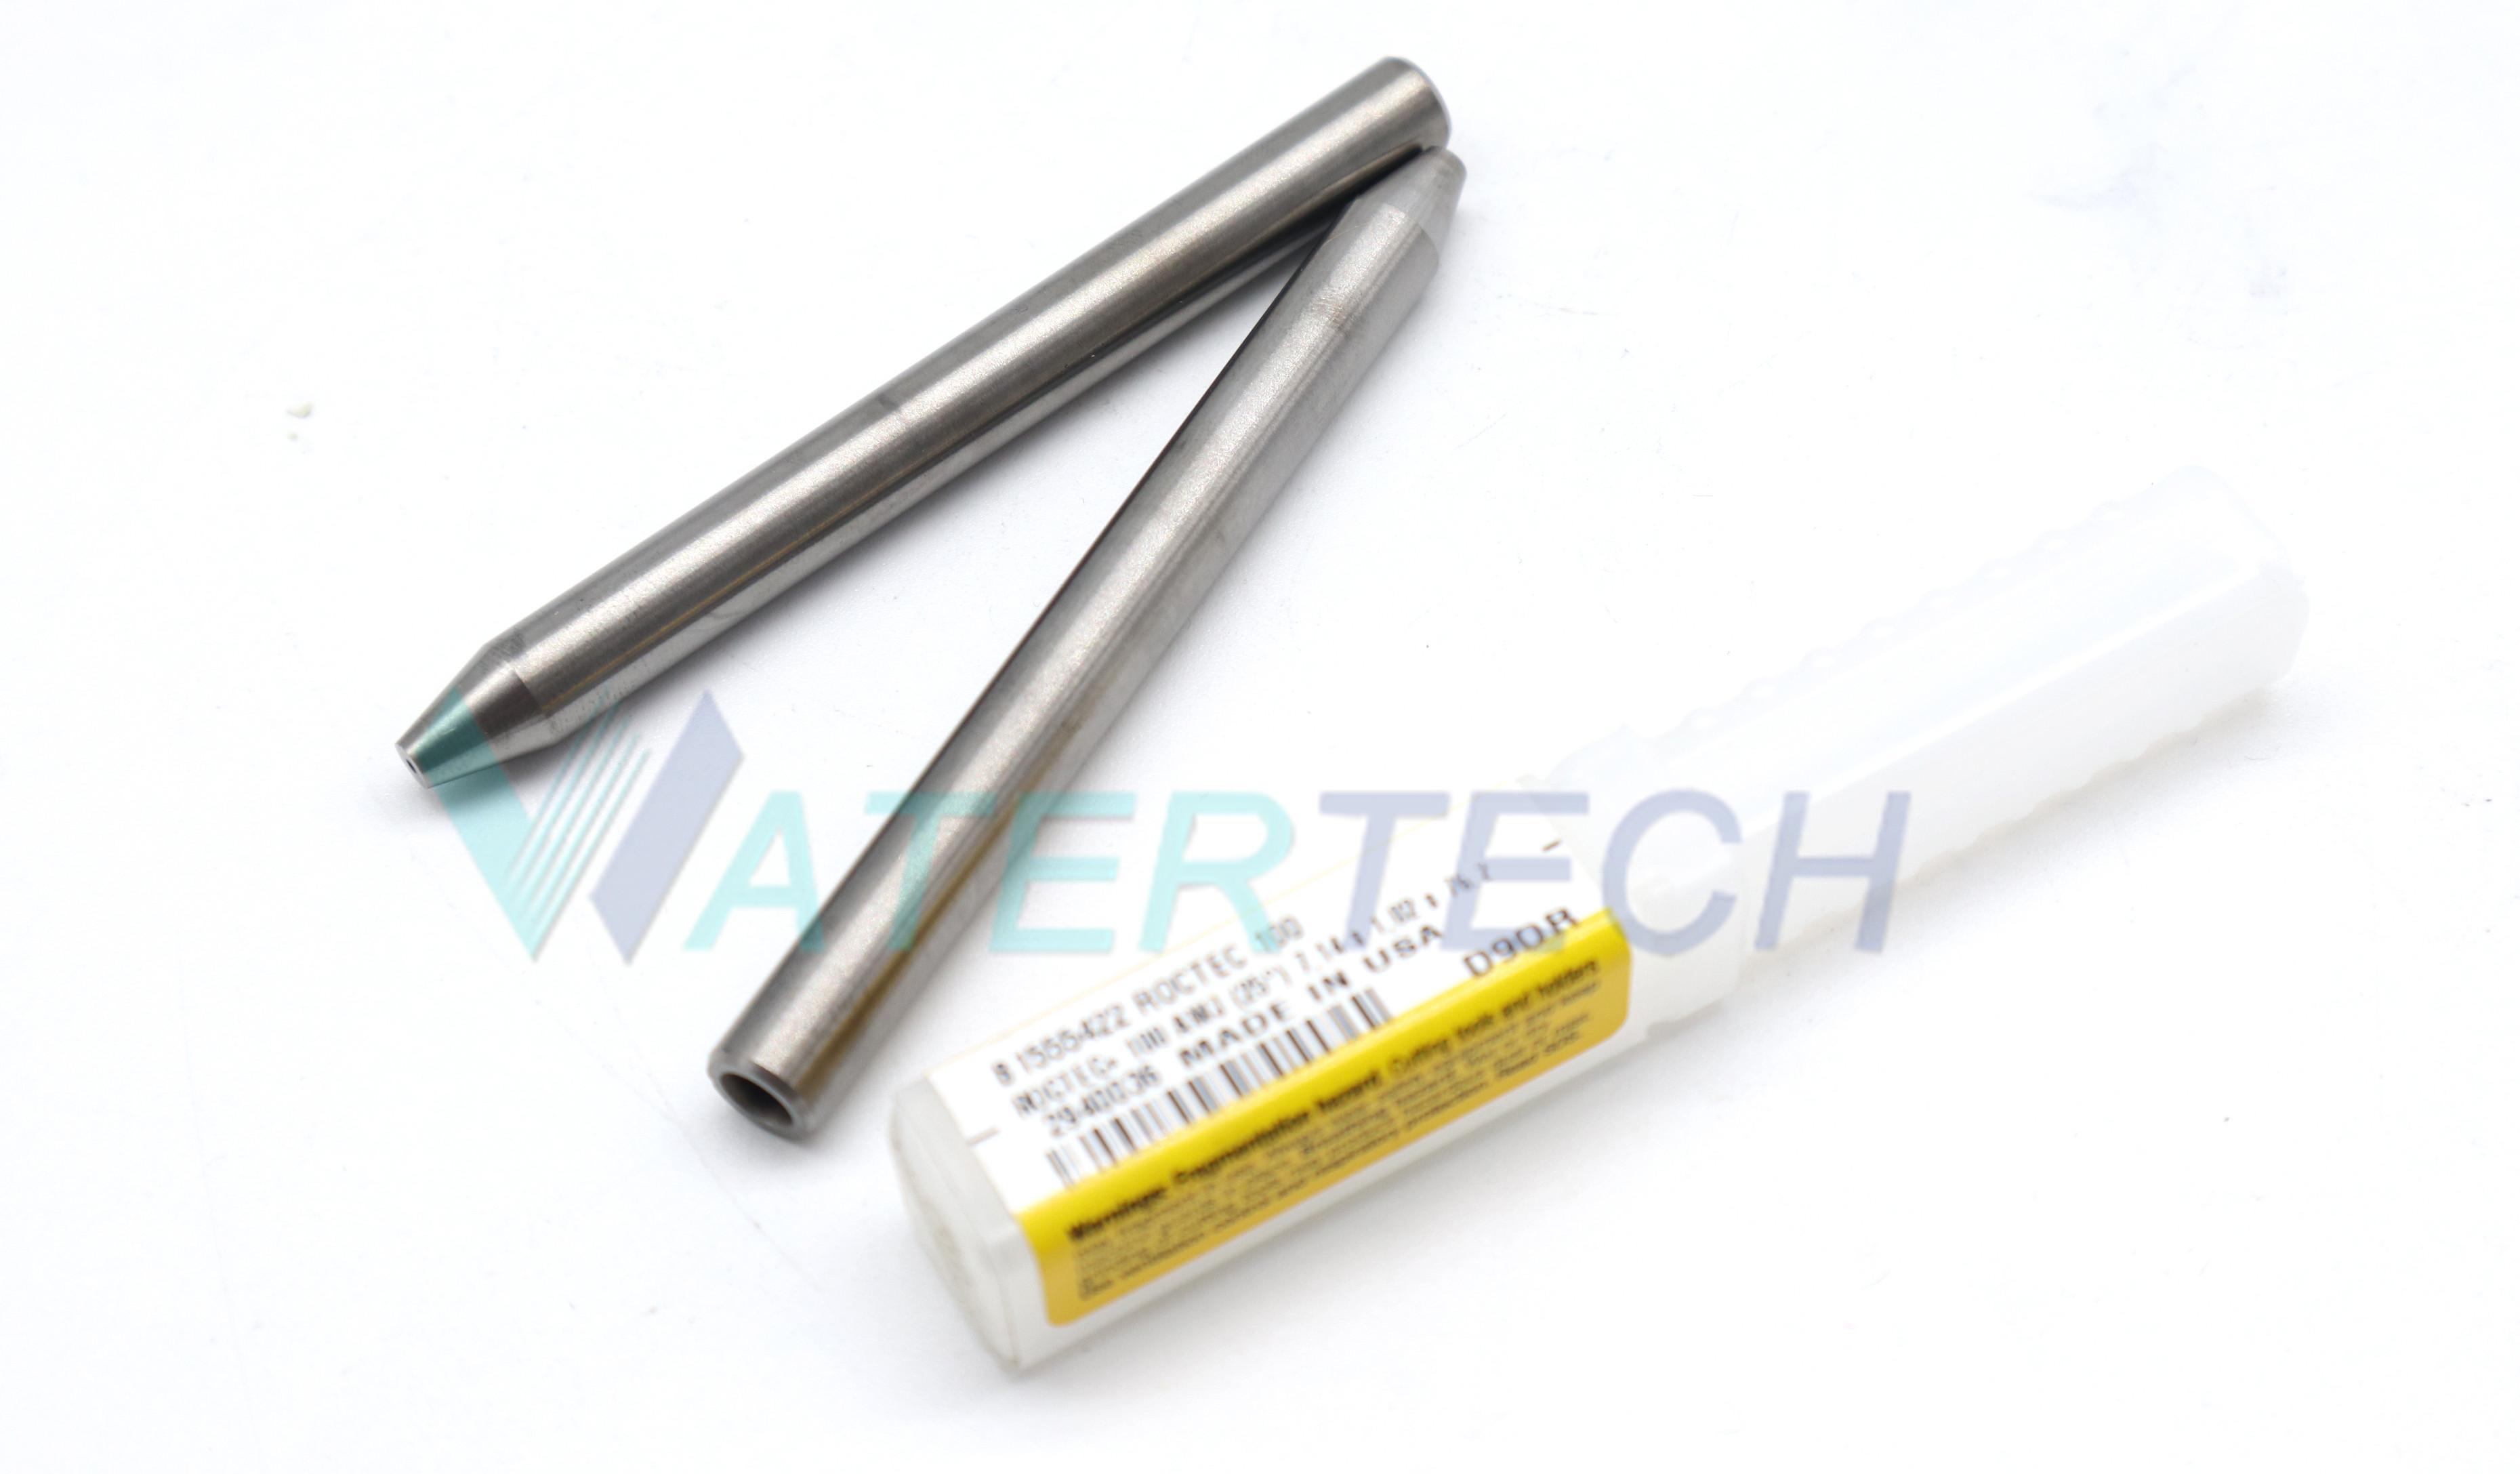 ".281"" X .035"" X 4"" Waterjet Nozzle for Waterjet Cutting Machine"